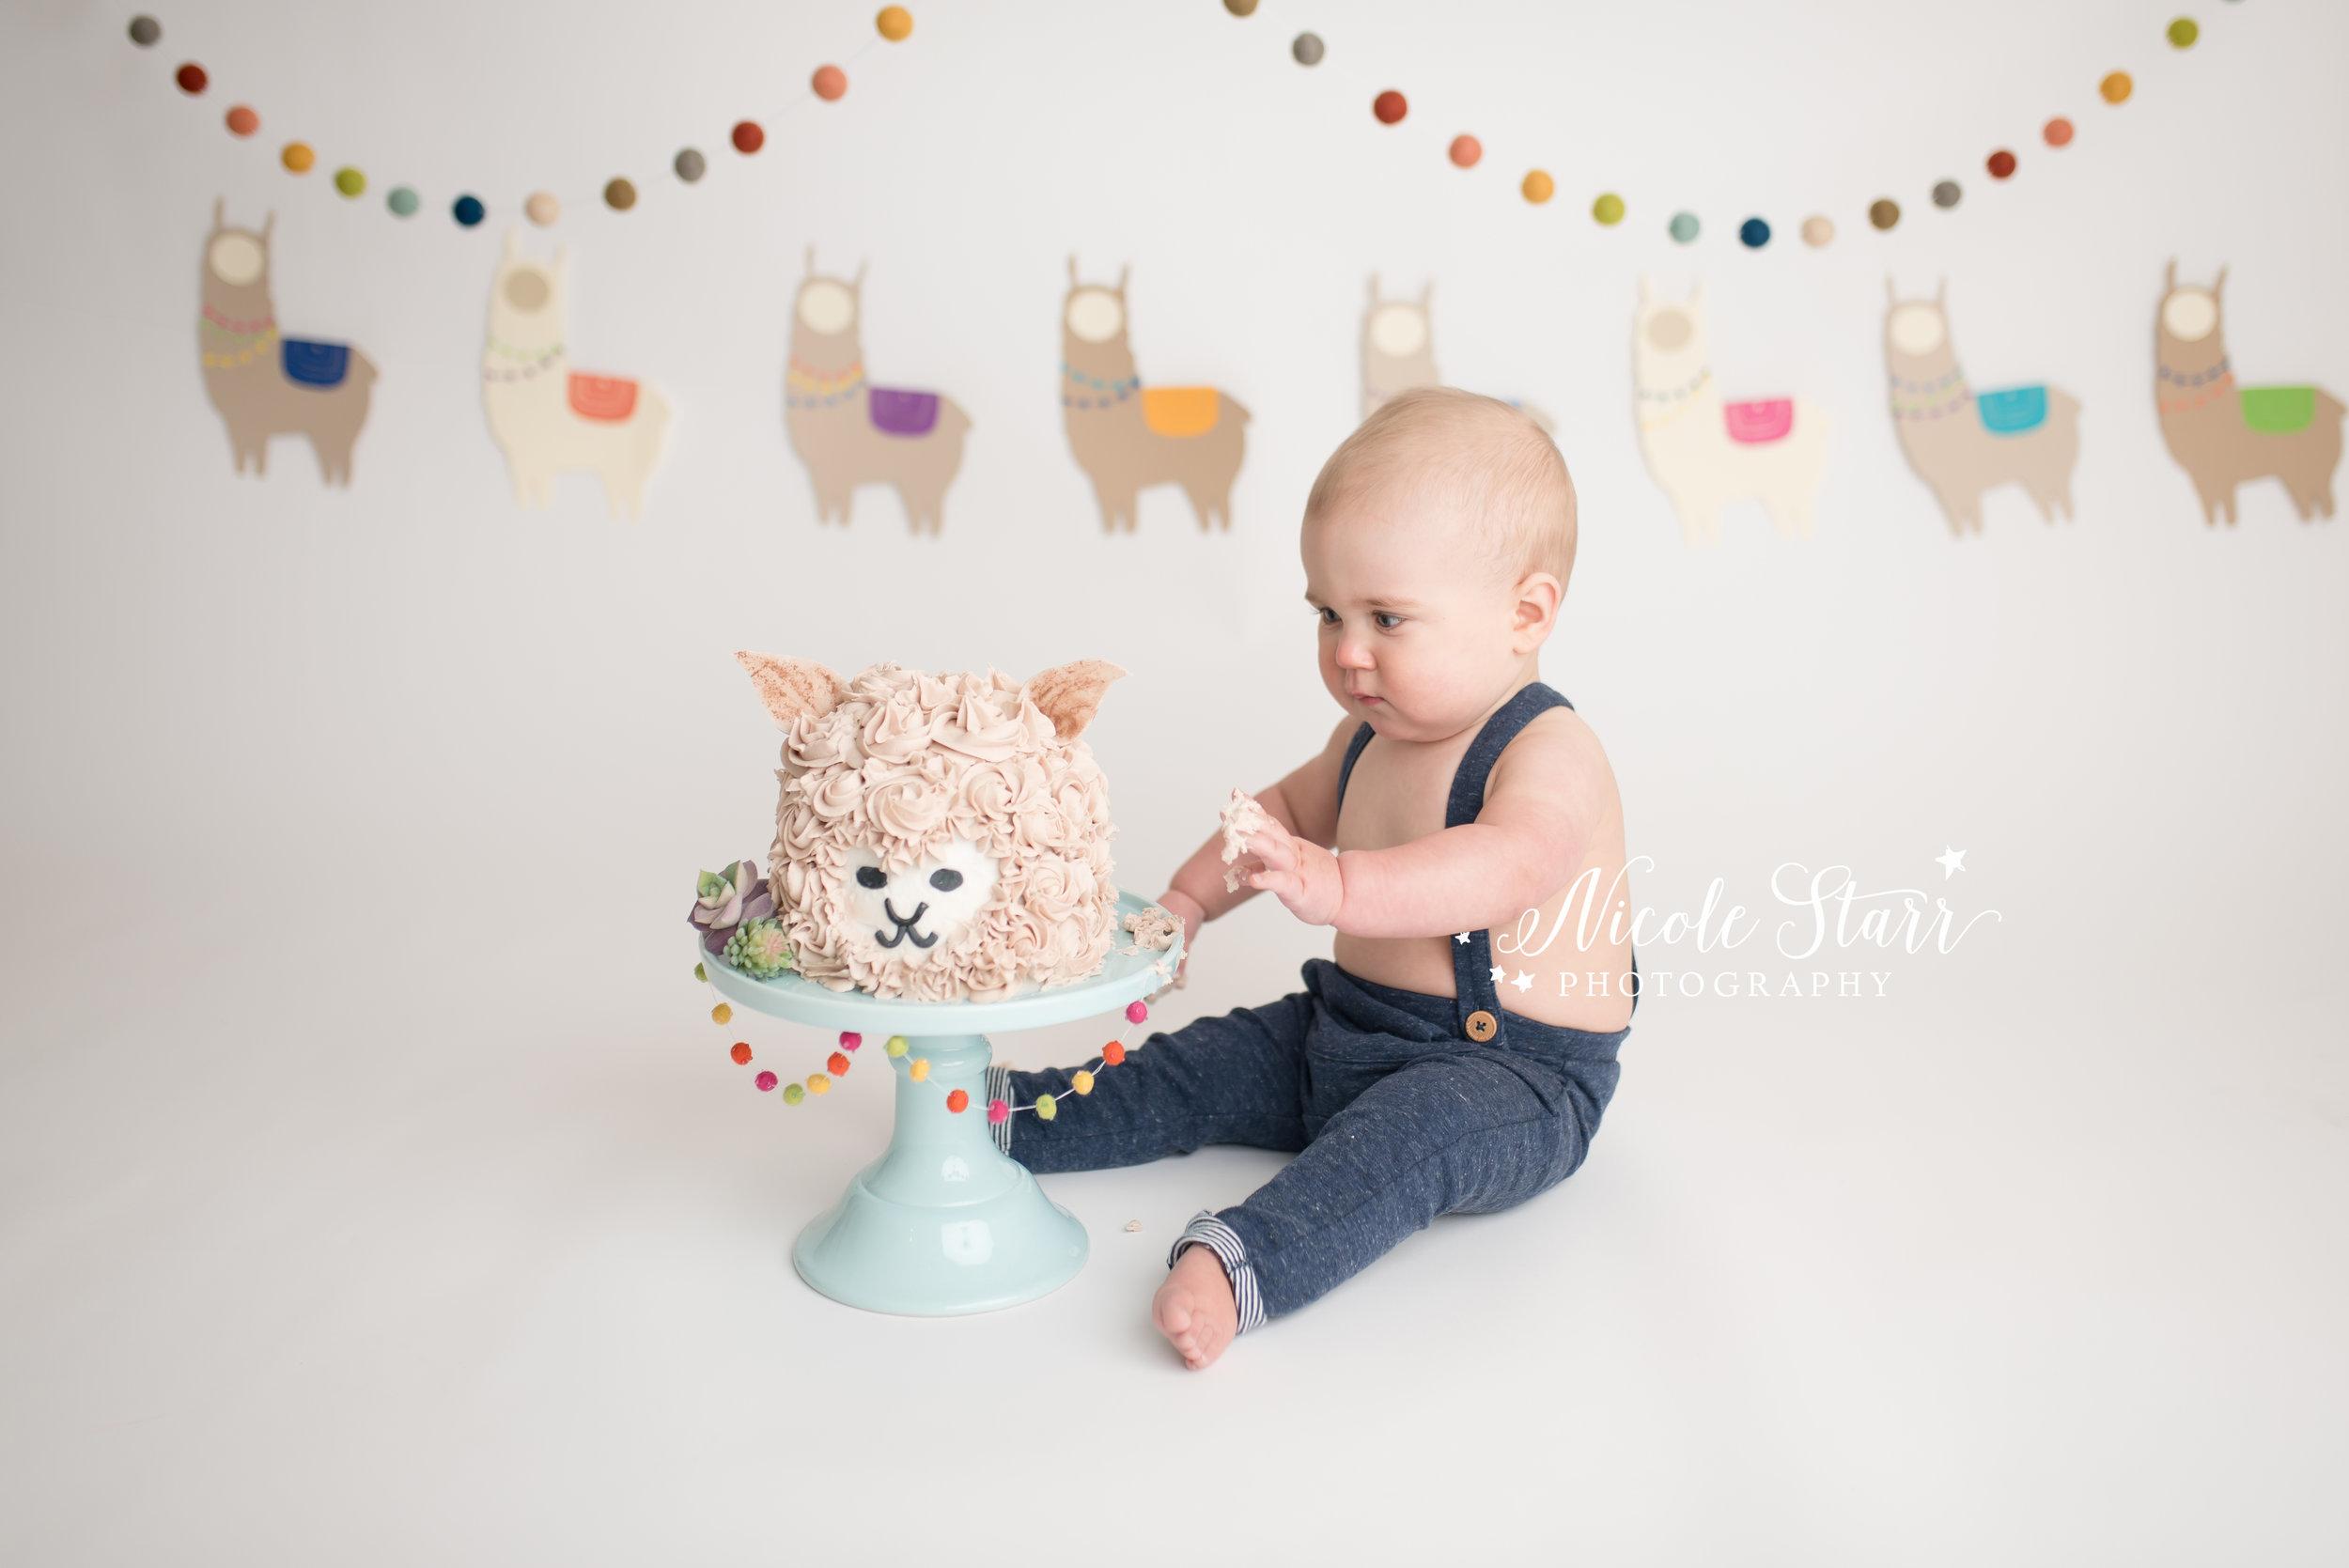 llama cake smash for baby's first birthday